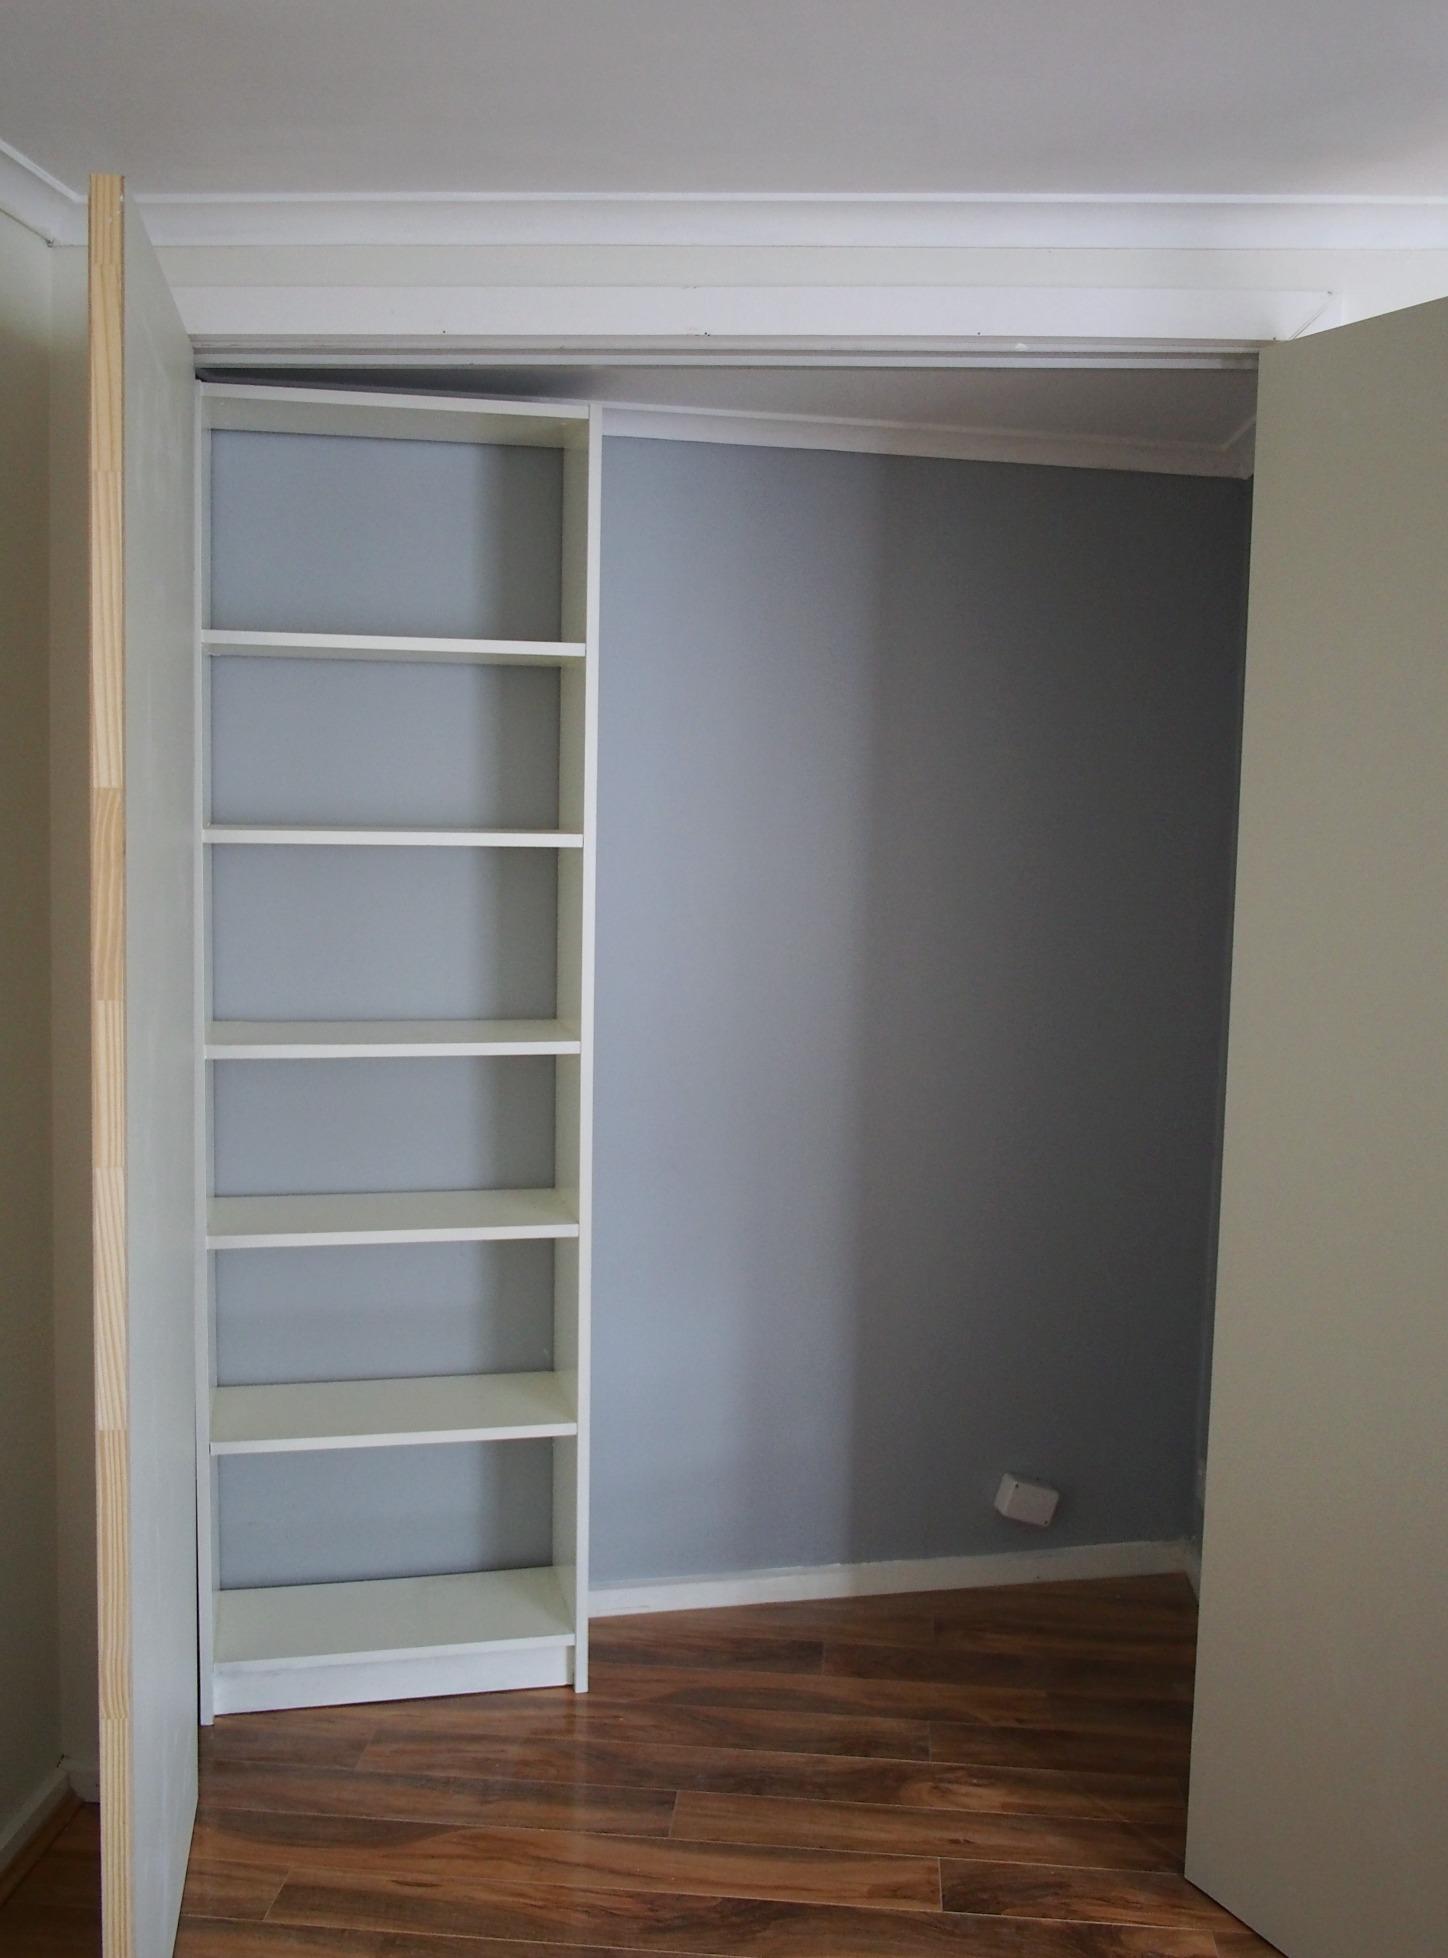 Billy bookcase in storage cupboard